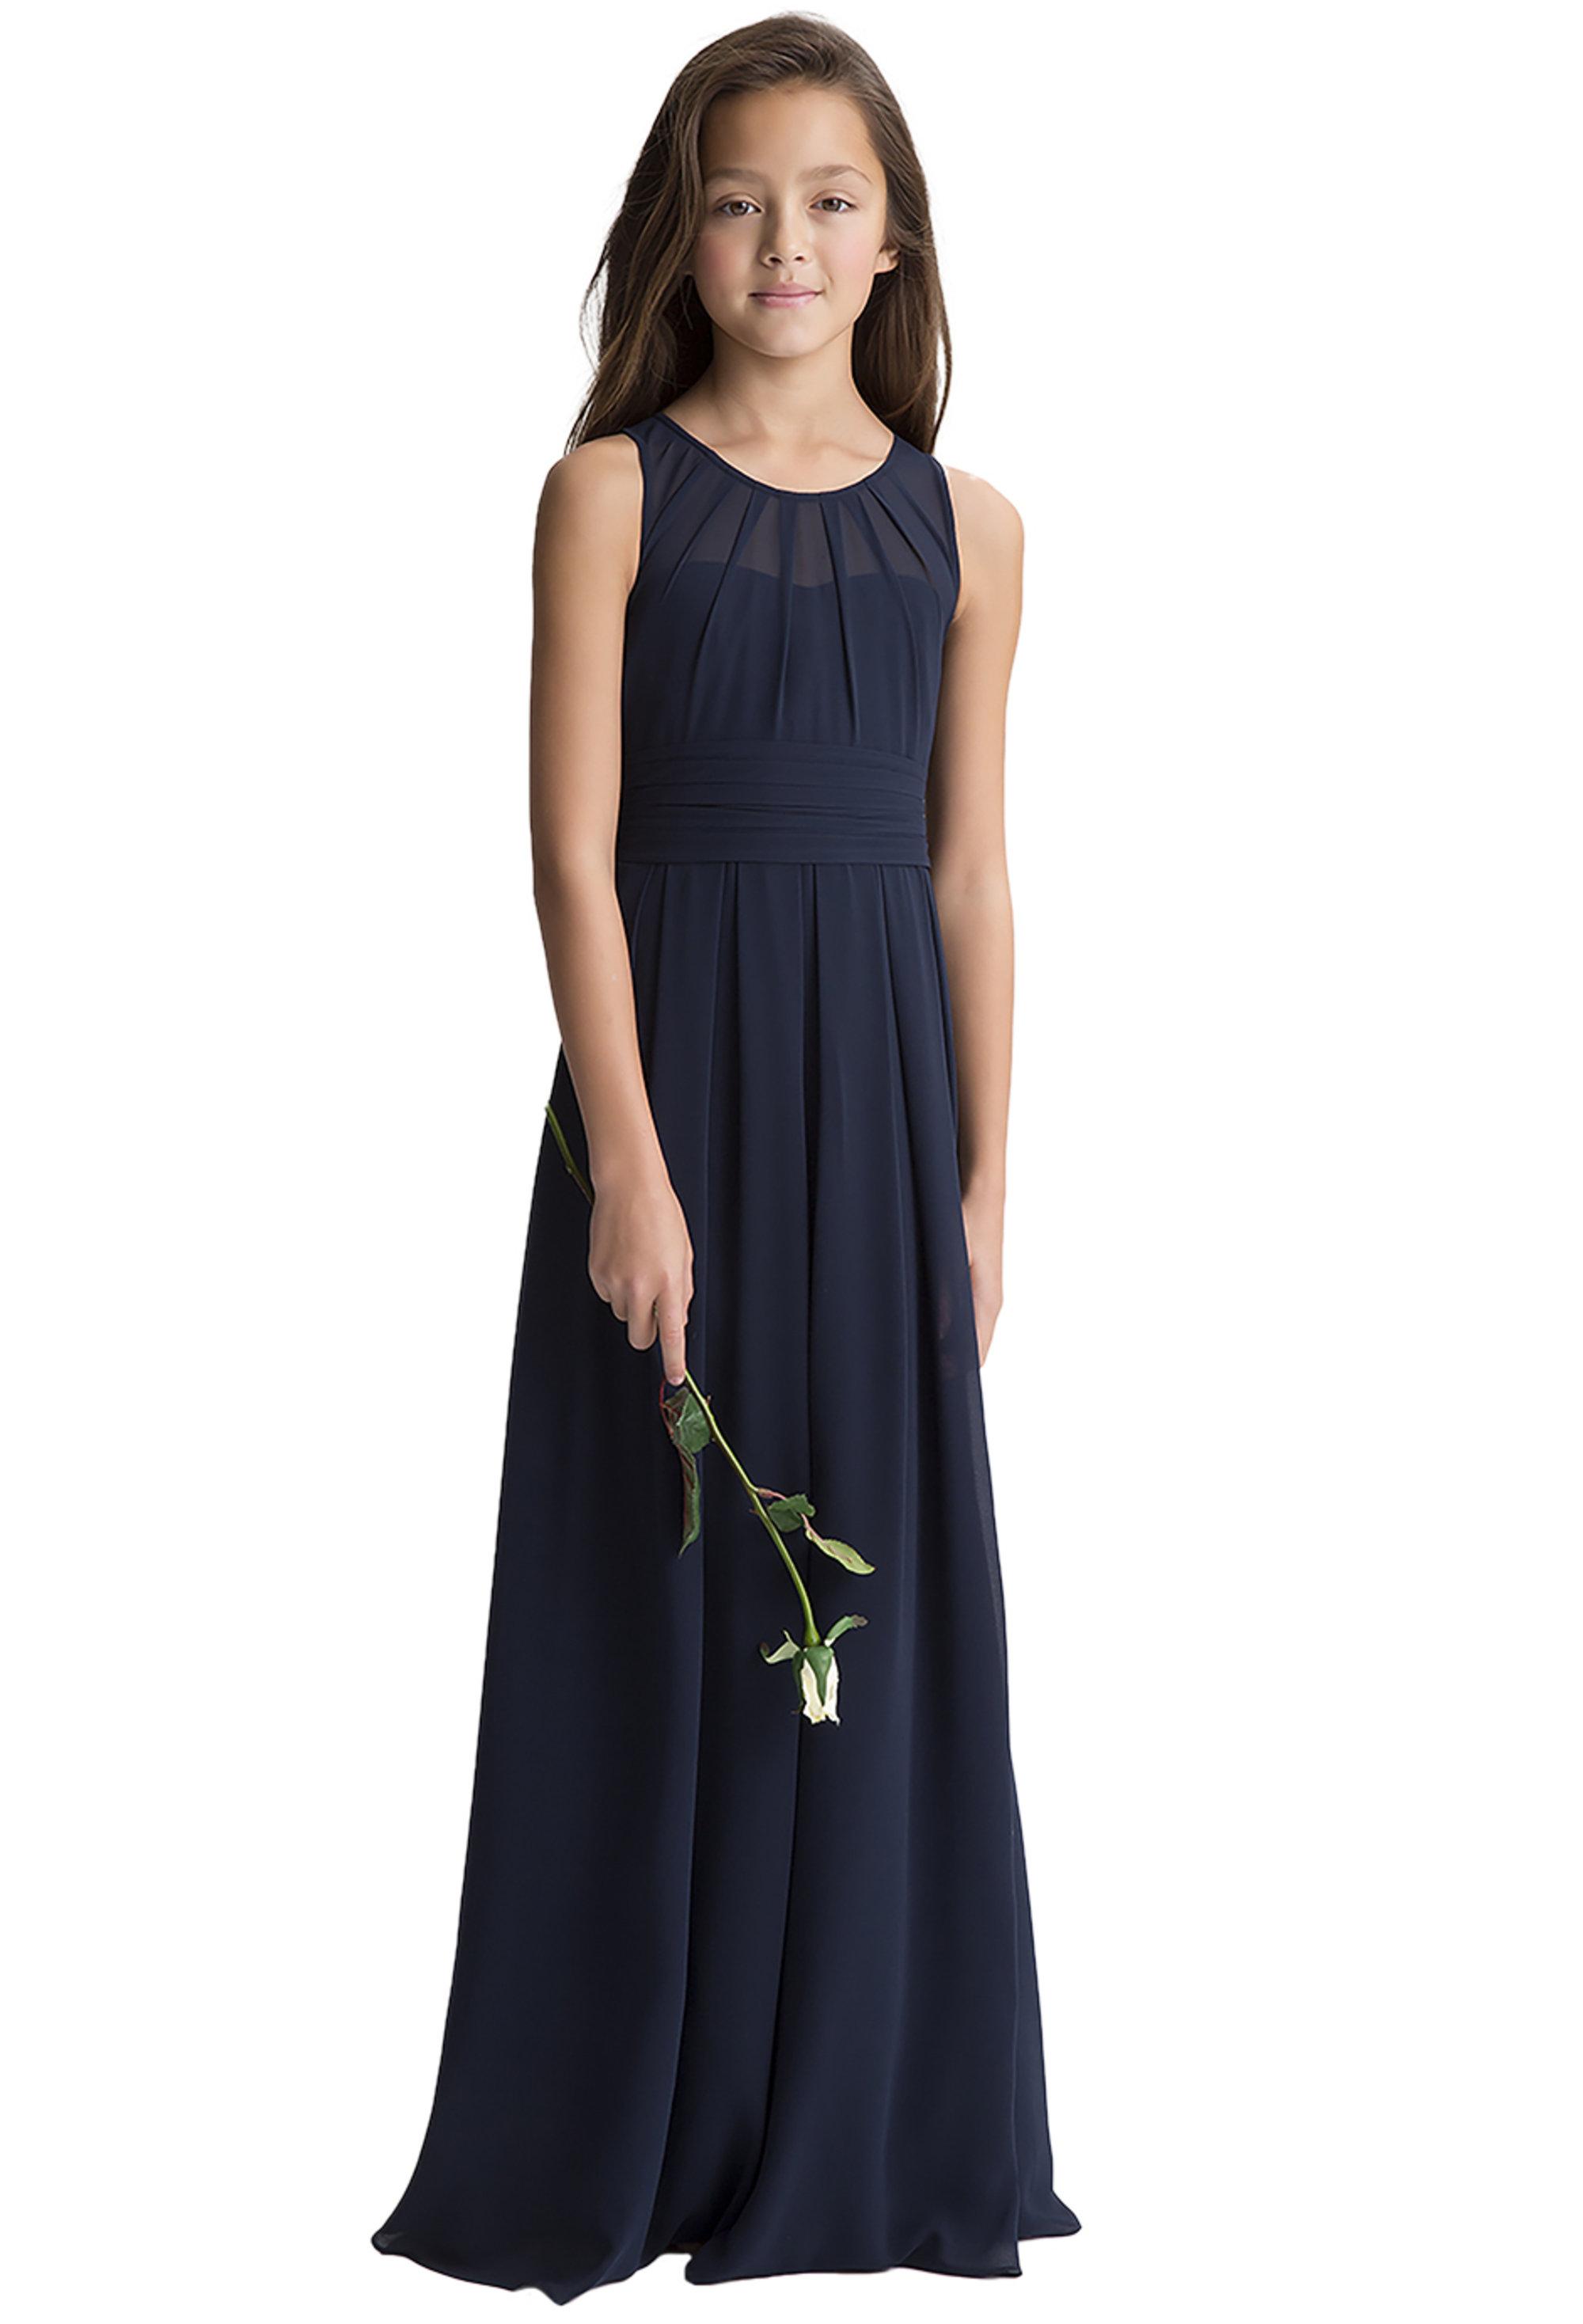 Bill Levkoff NAVY    gown, $190.00 Front